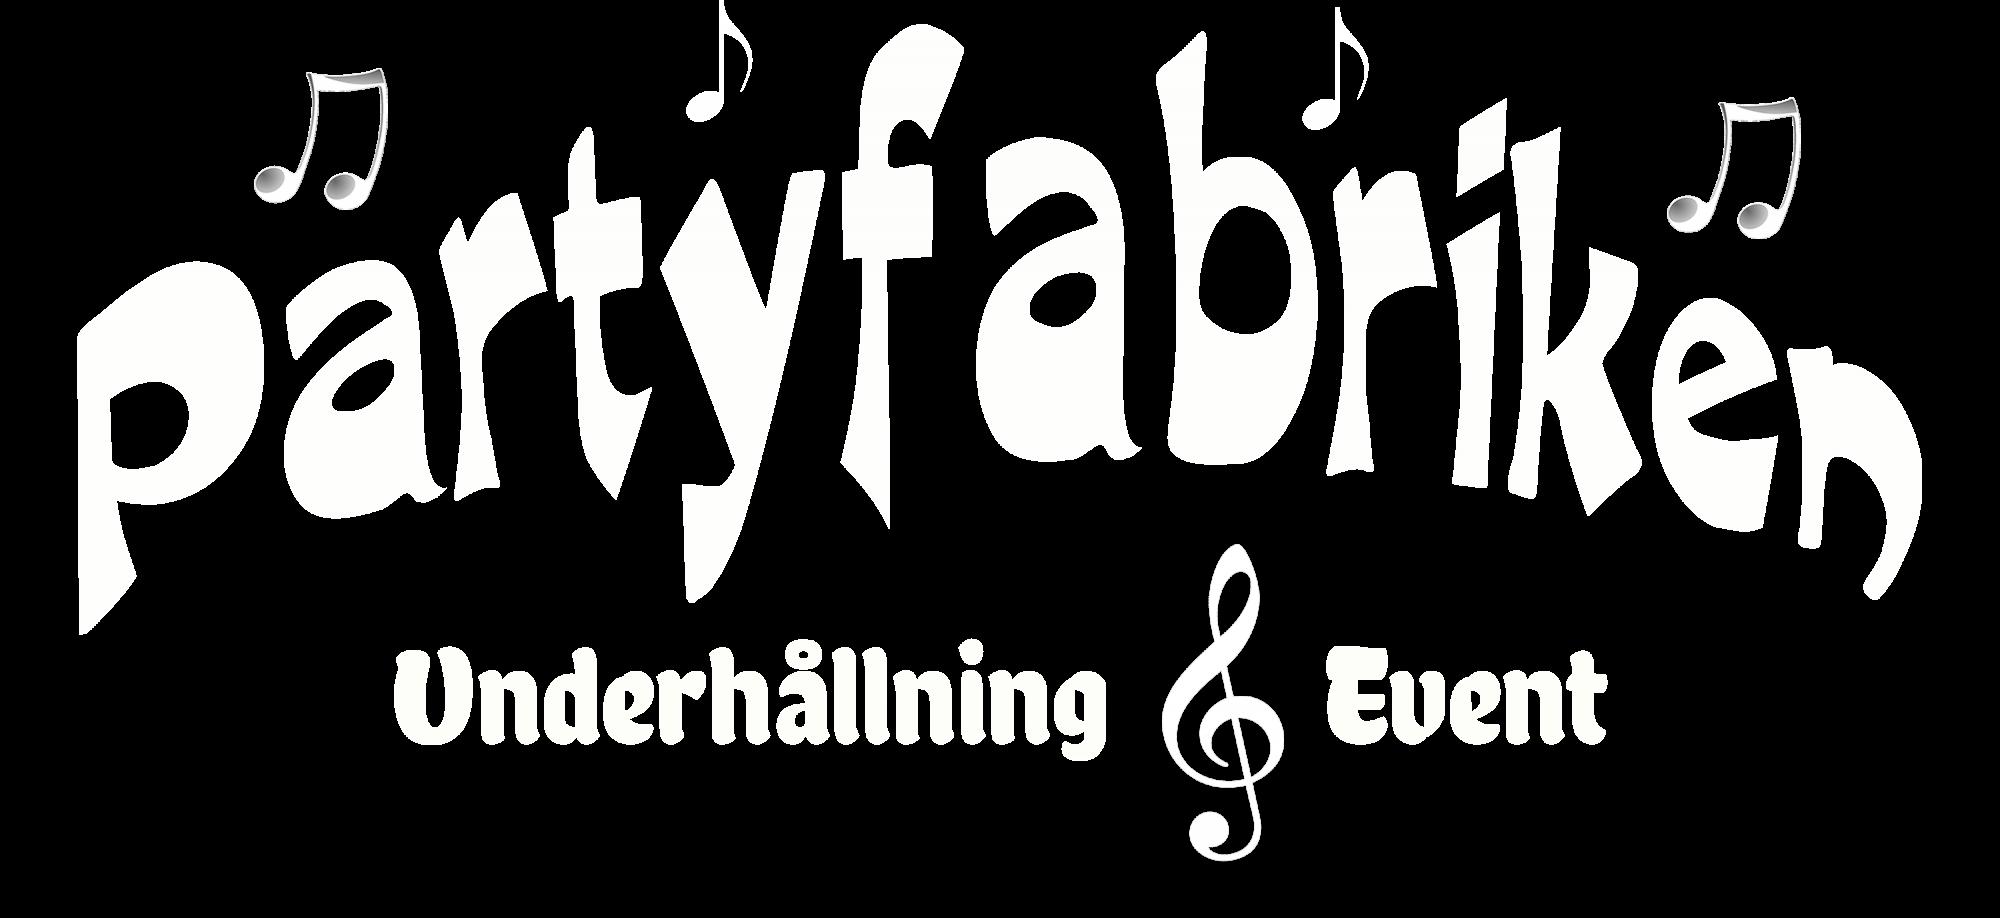 Partyfabriken, Pf